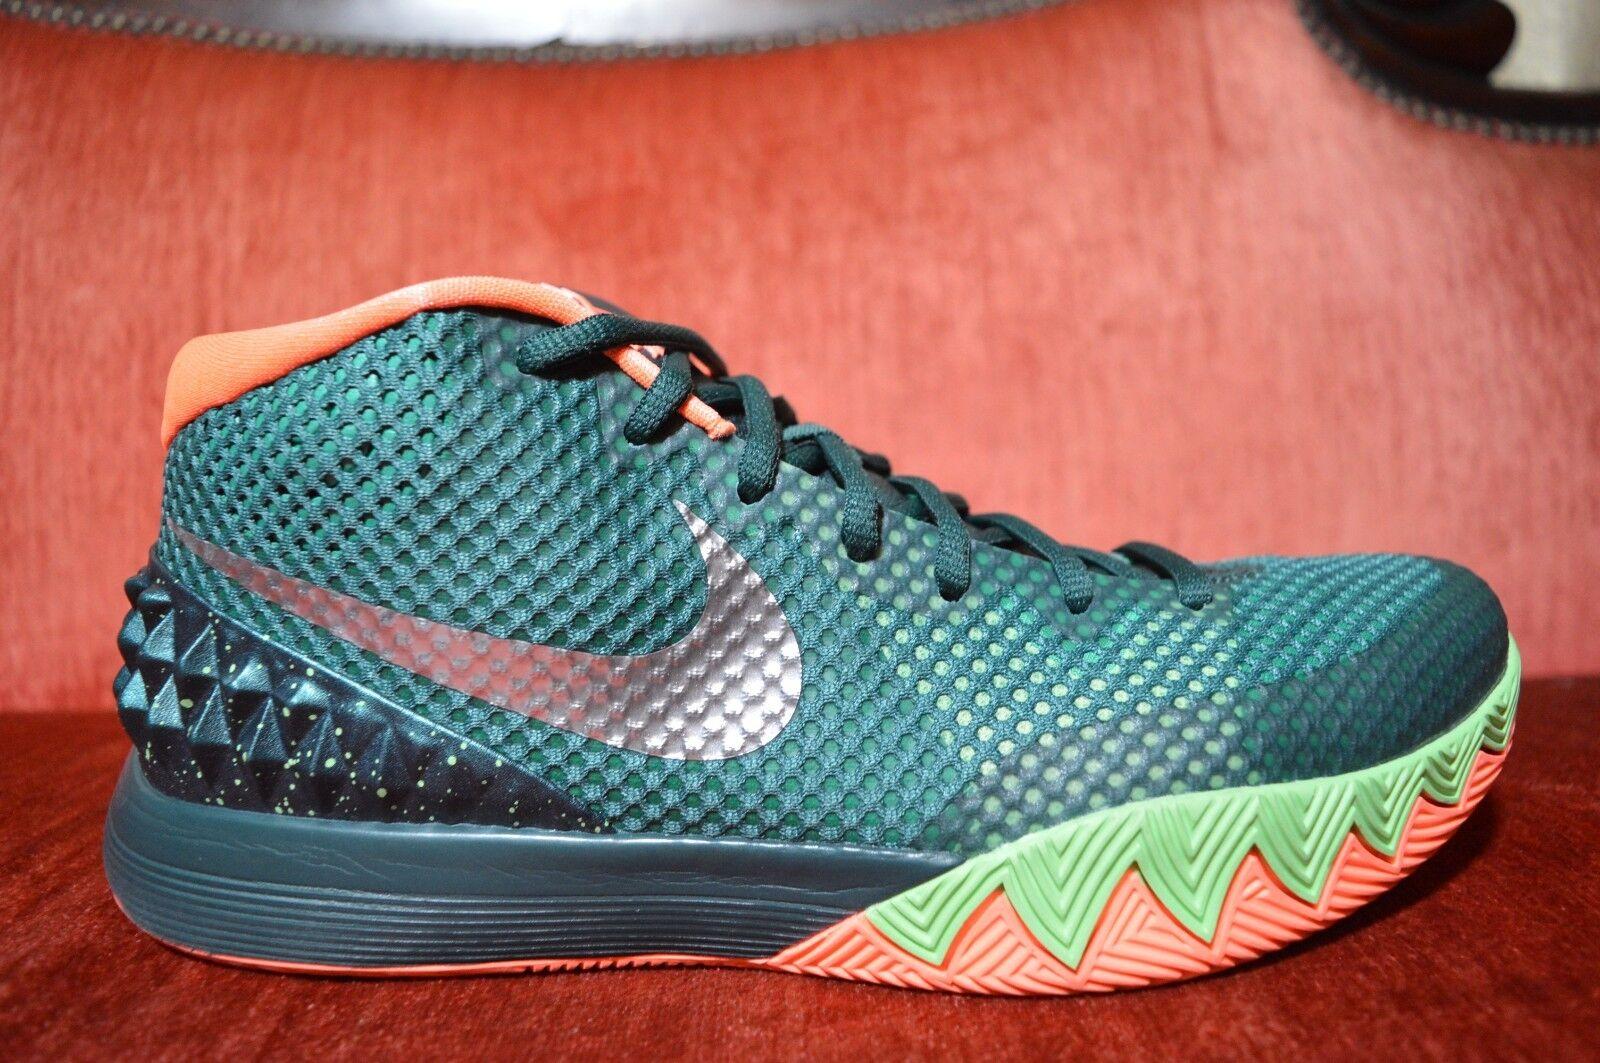 Nike Kyrie 1 Venus Flytrap 705277-313 Emerald Green Silver Basketball Size 9.5